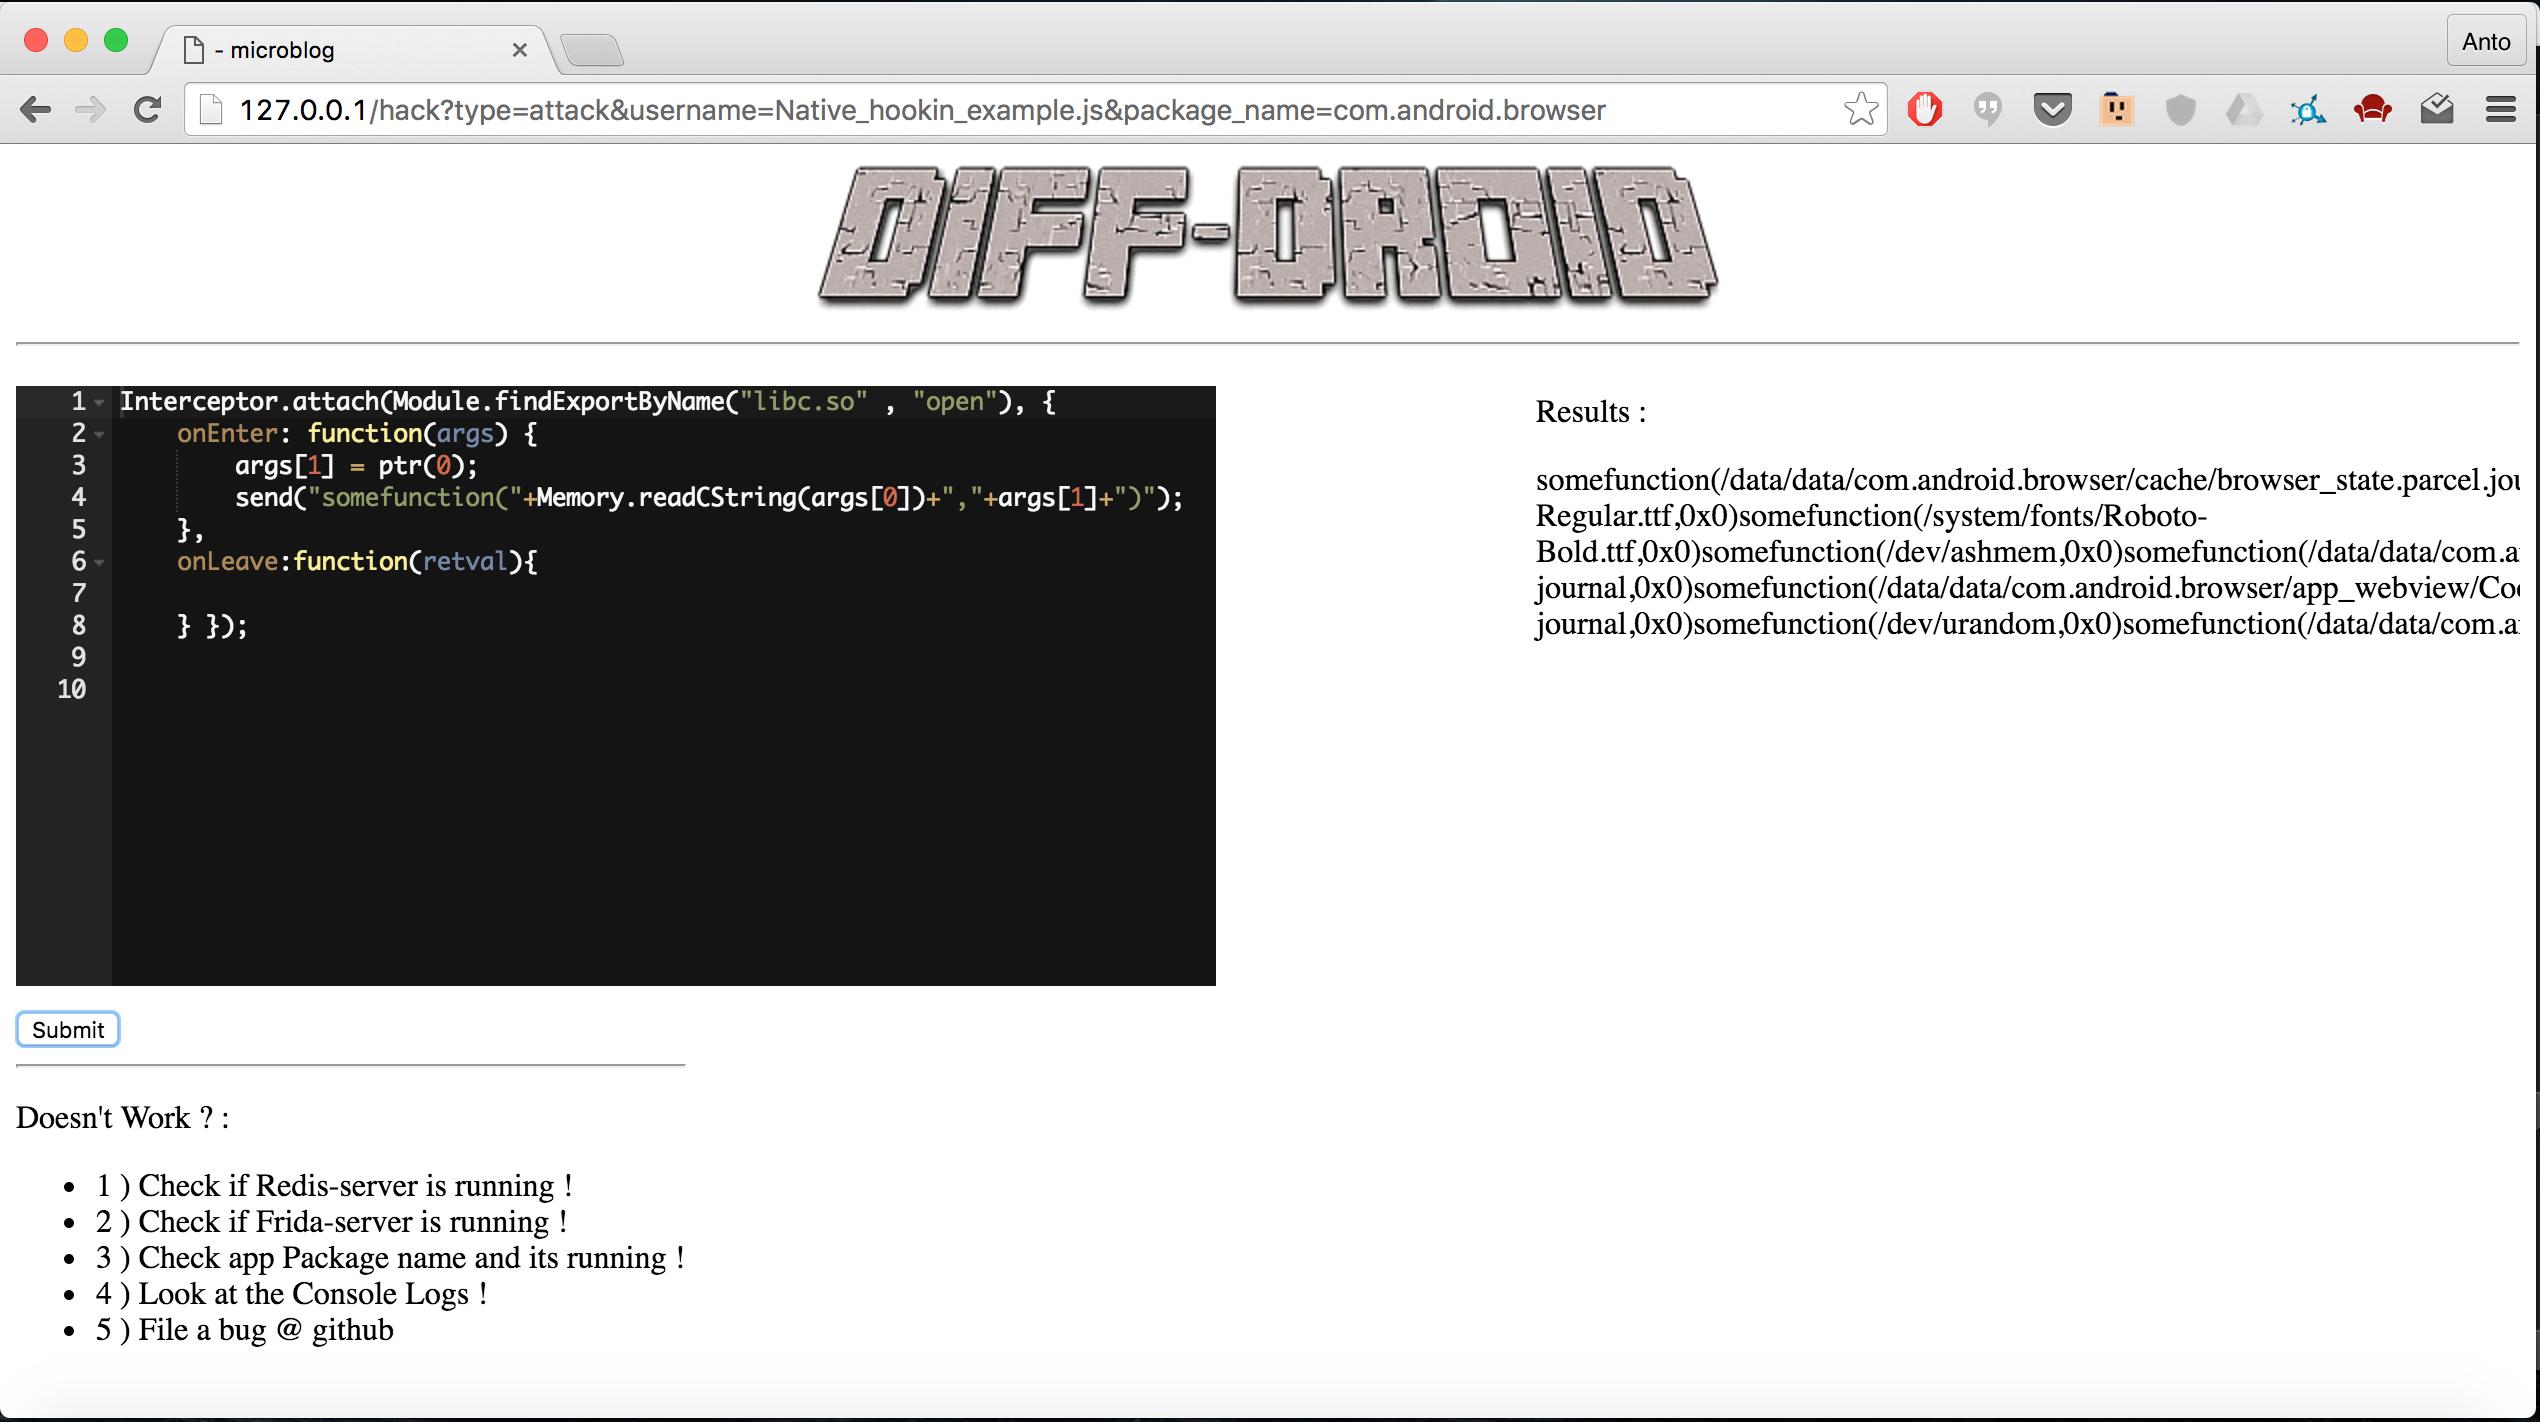 GitHub - antojoseph/diff-gui: GUI for Frida -Scripts